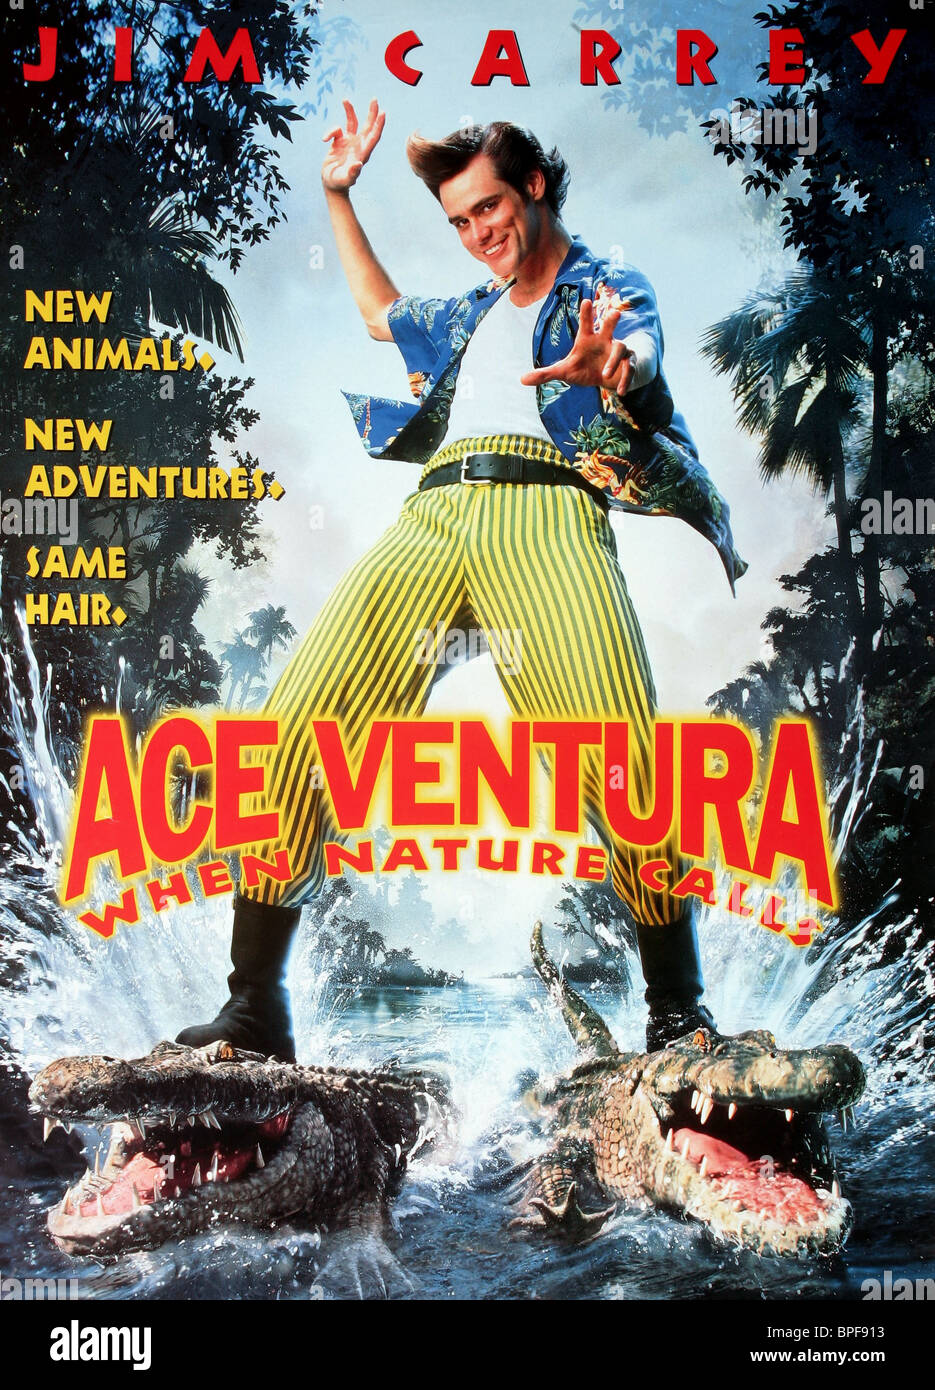 Ace Ventura When Nature Calls Movie Online Free